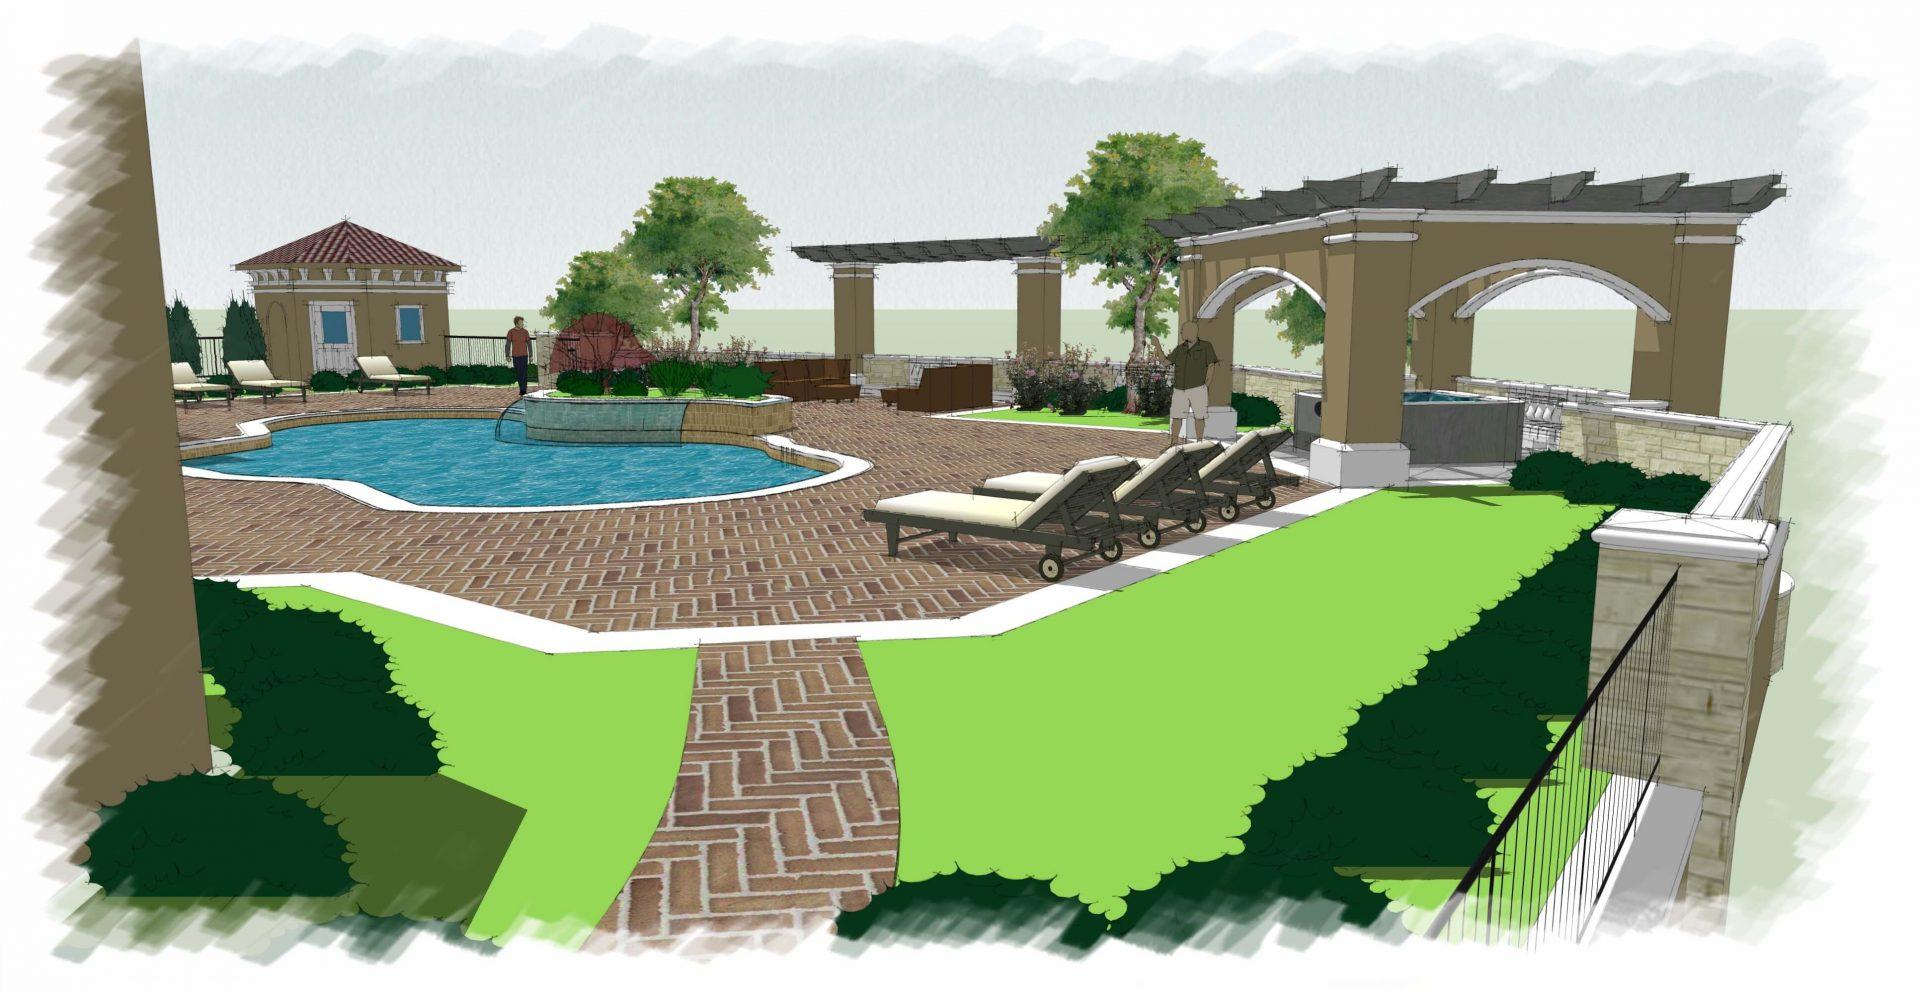 cliff drive garden design and architecture